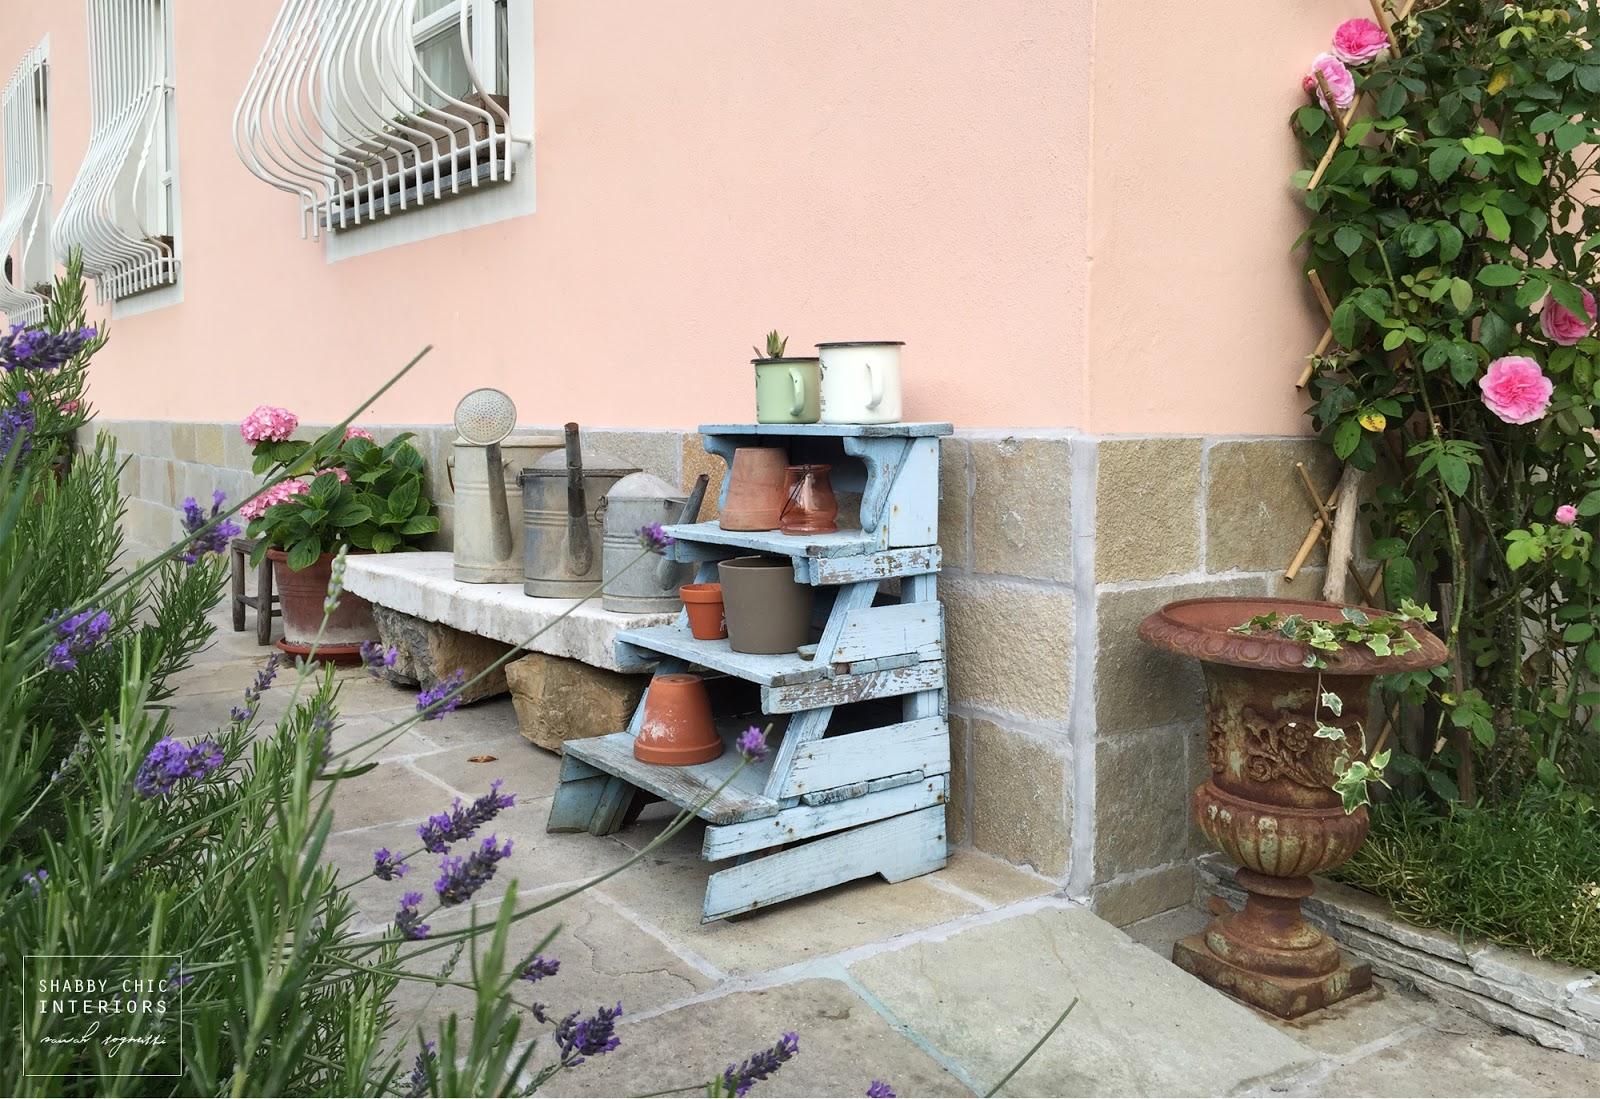 Best Il Mio Piccolo Giardino With Giardini Shabby Chic